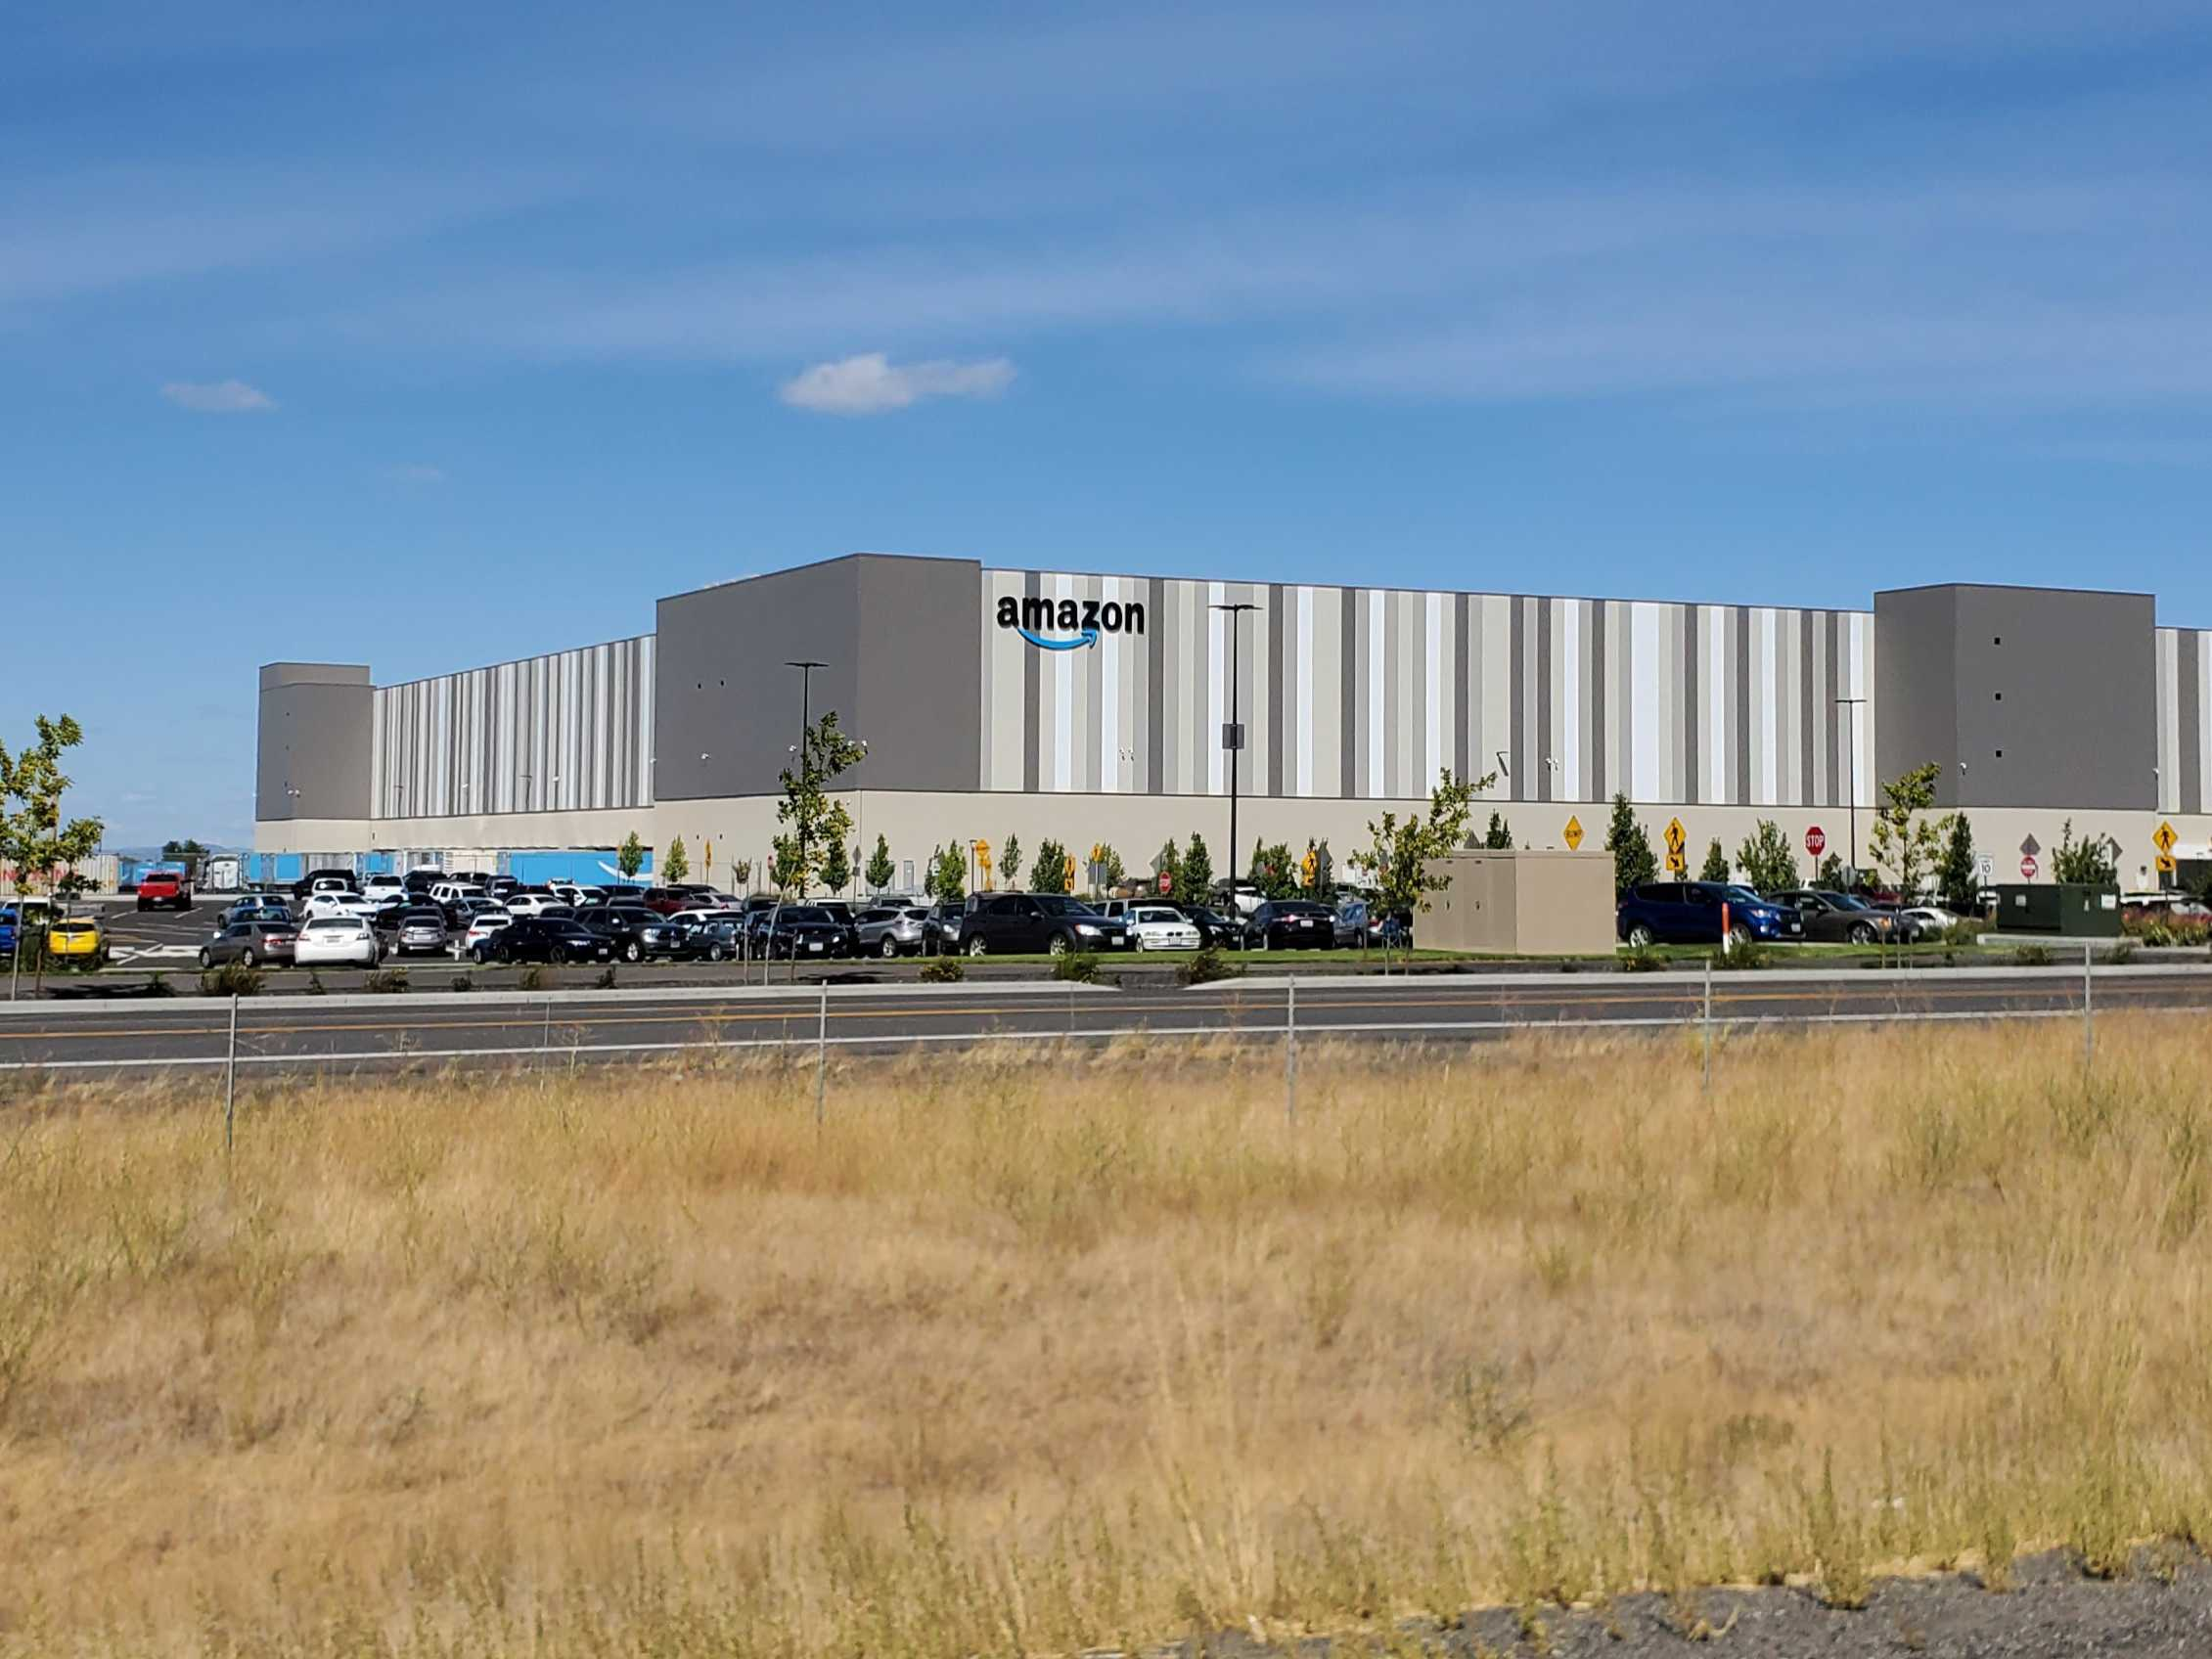 California legislation to aid Amazon warehouse workers won't replace ongoing unionization efforts